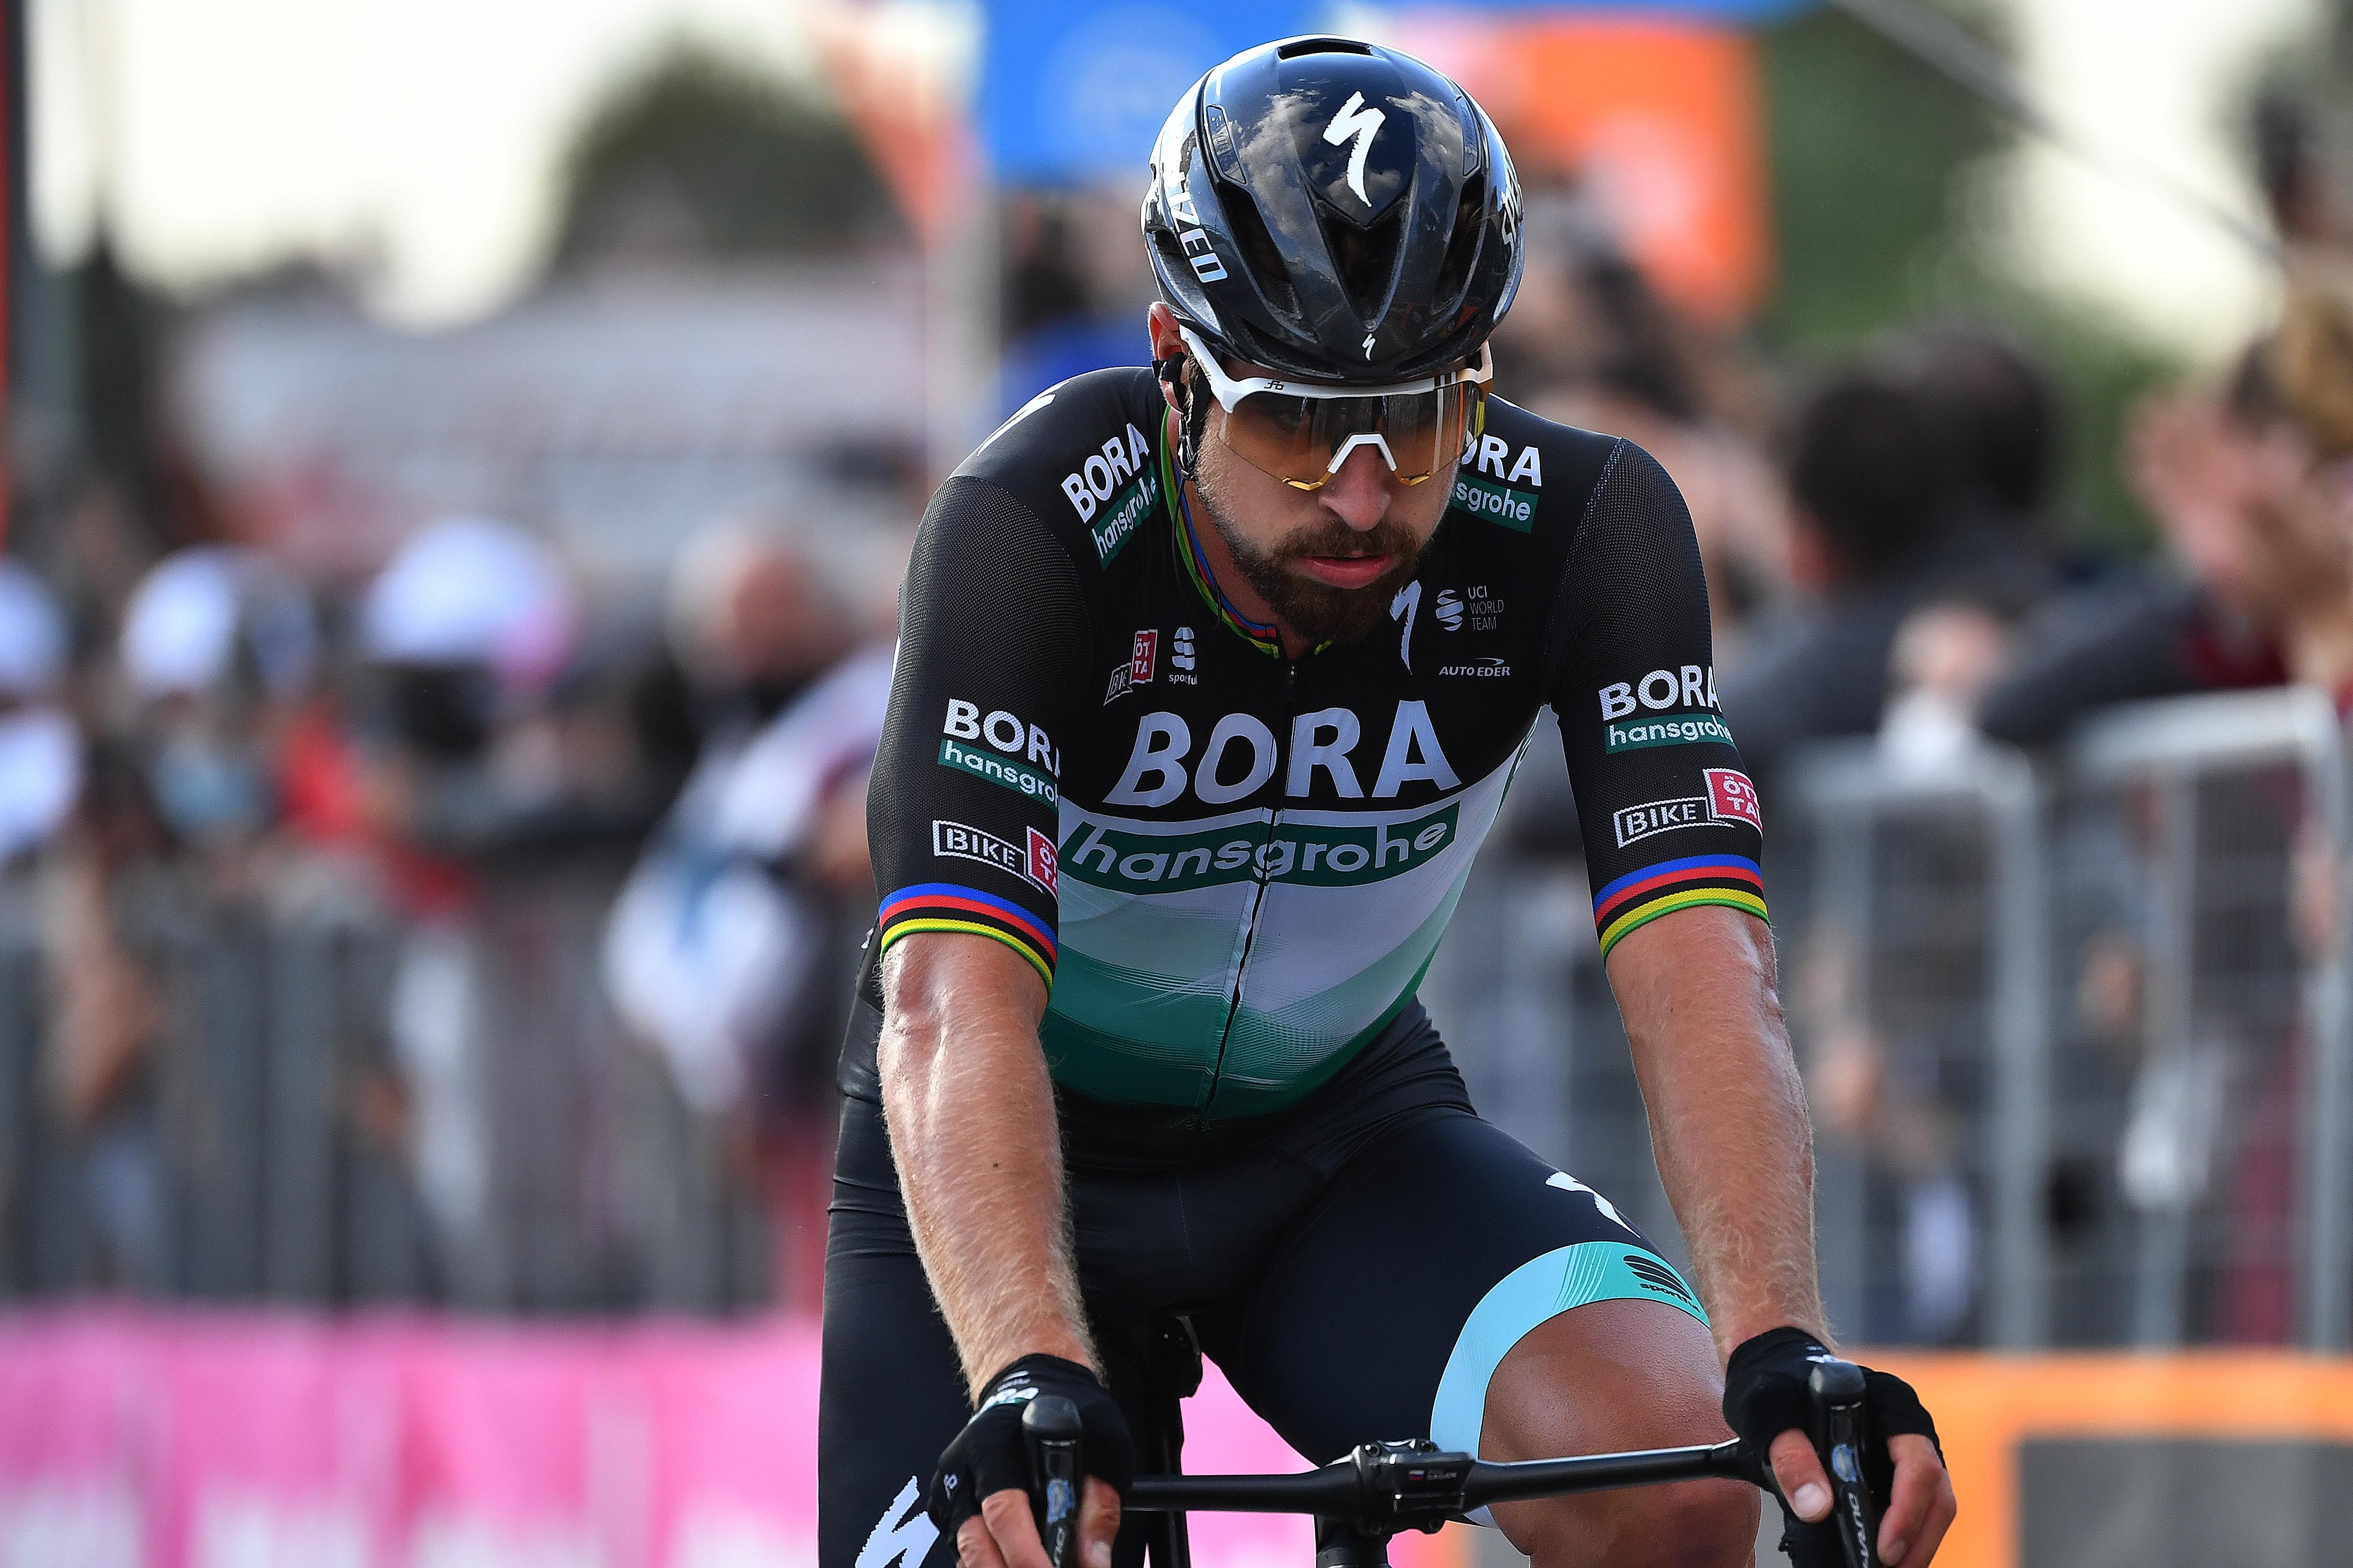 103rd Giro d'Italia 2020 - Stage Thirteen